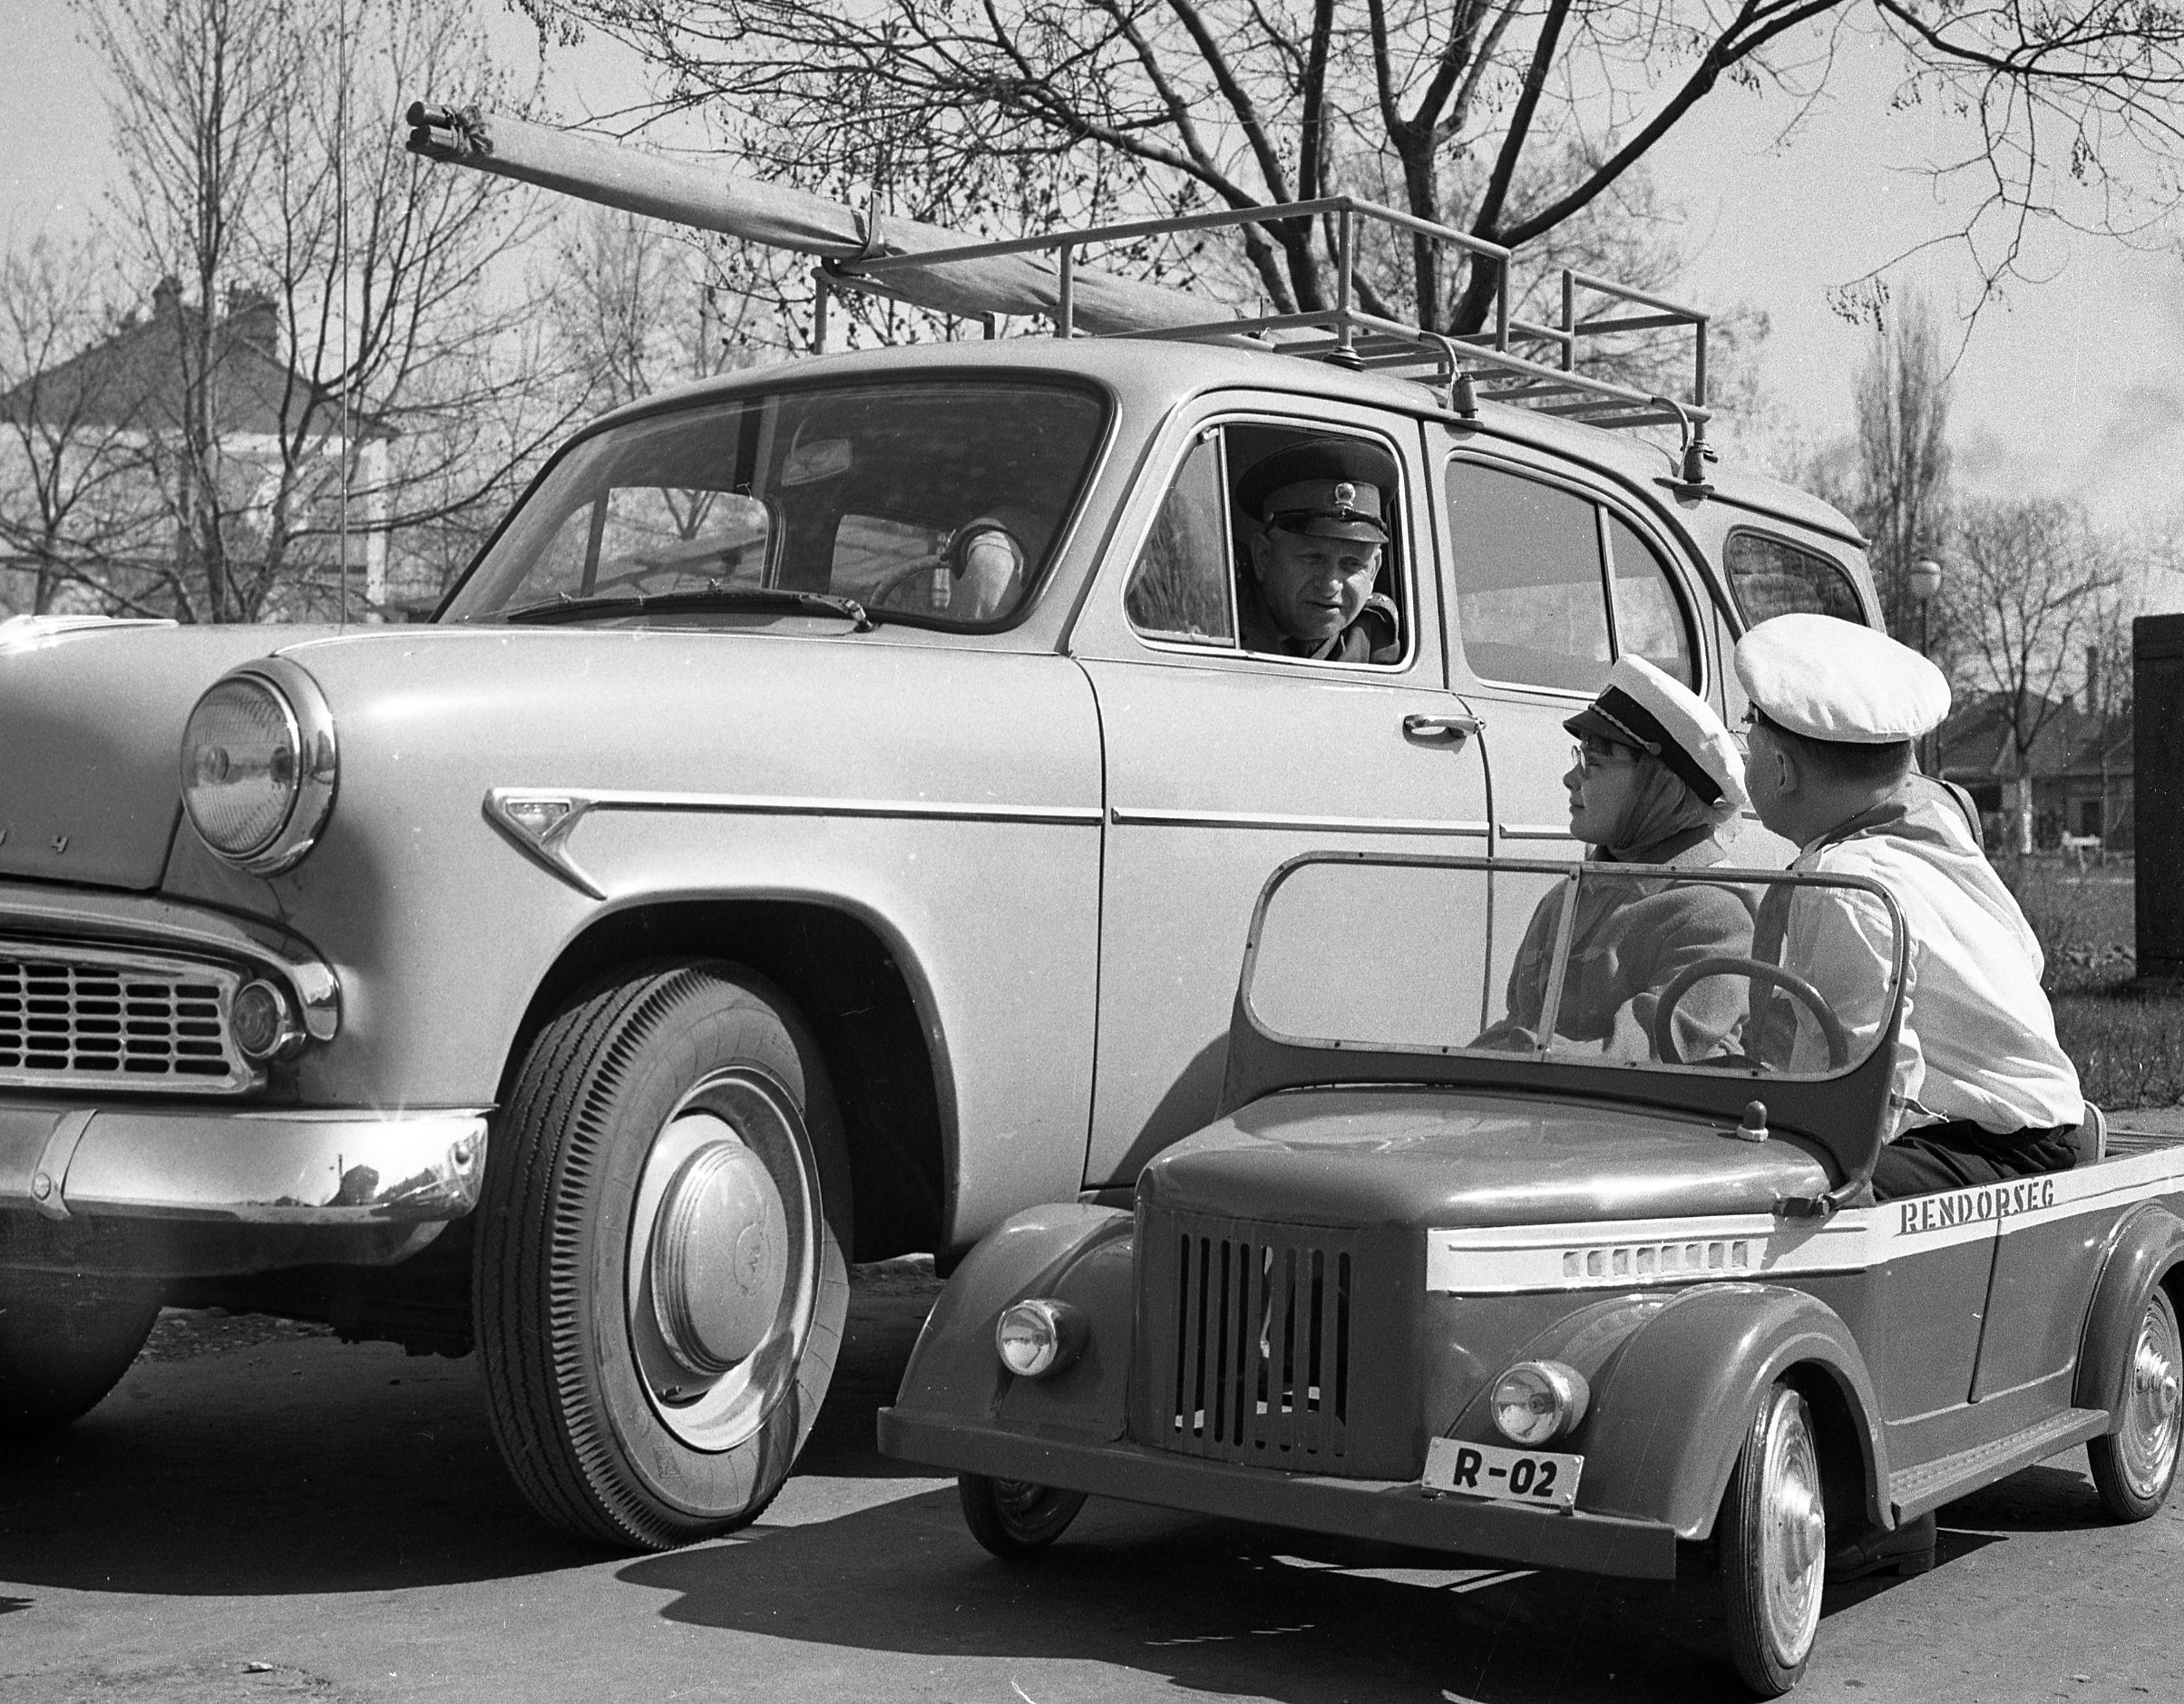 children in toy police car talk to policeman